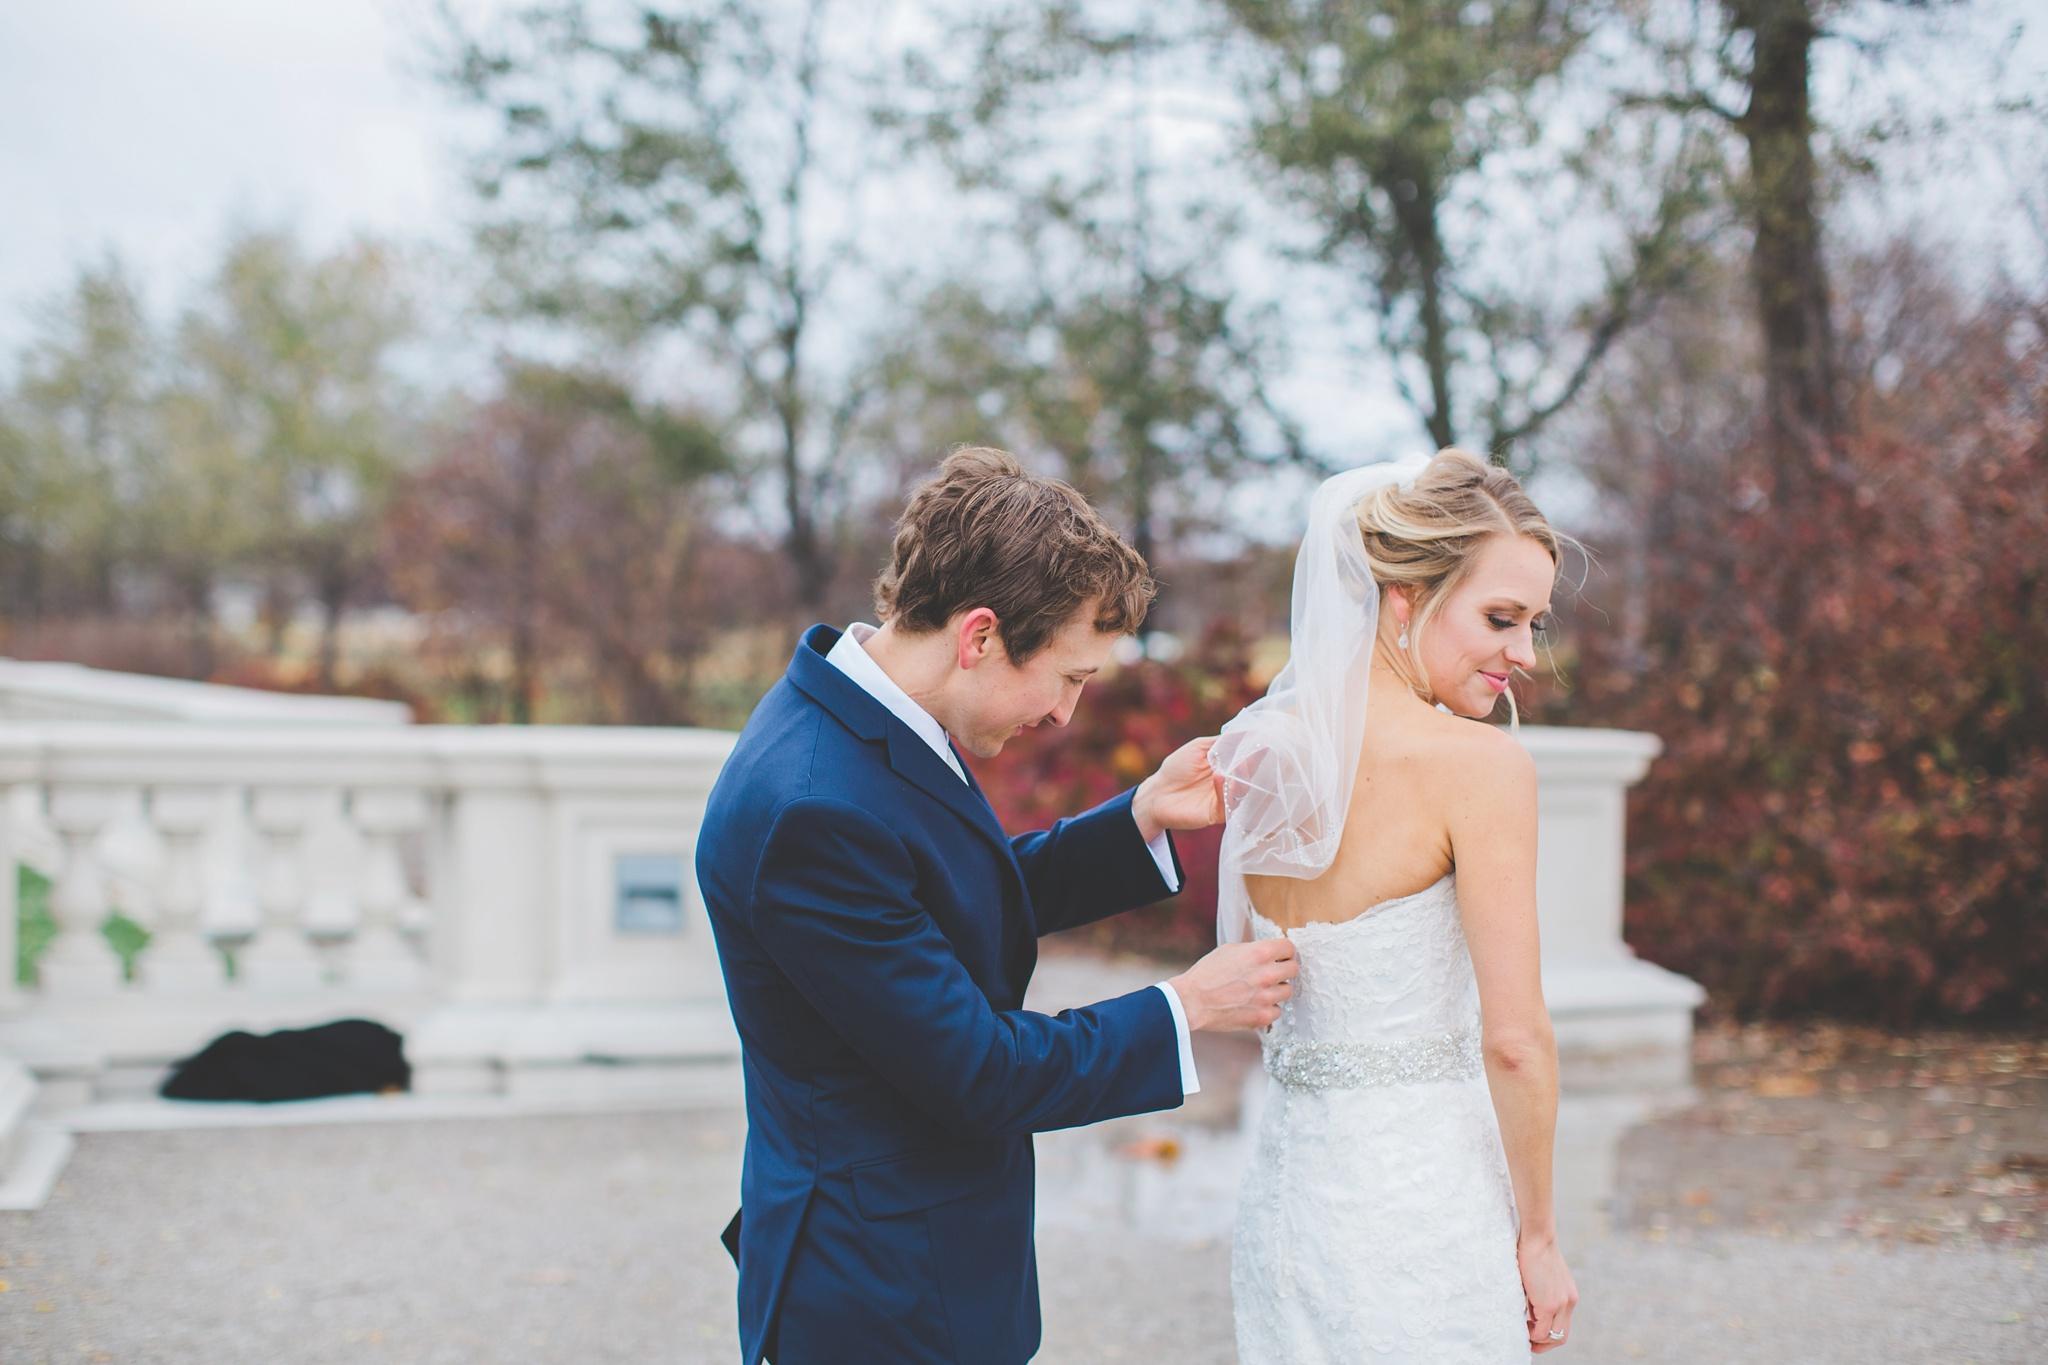 St. Louis Wedding Photographer   Chandler Rose Photography_0019.jpg